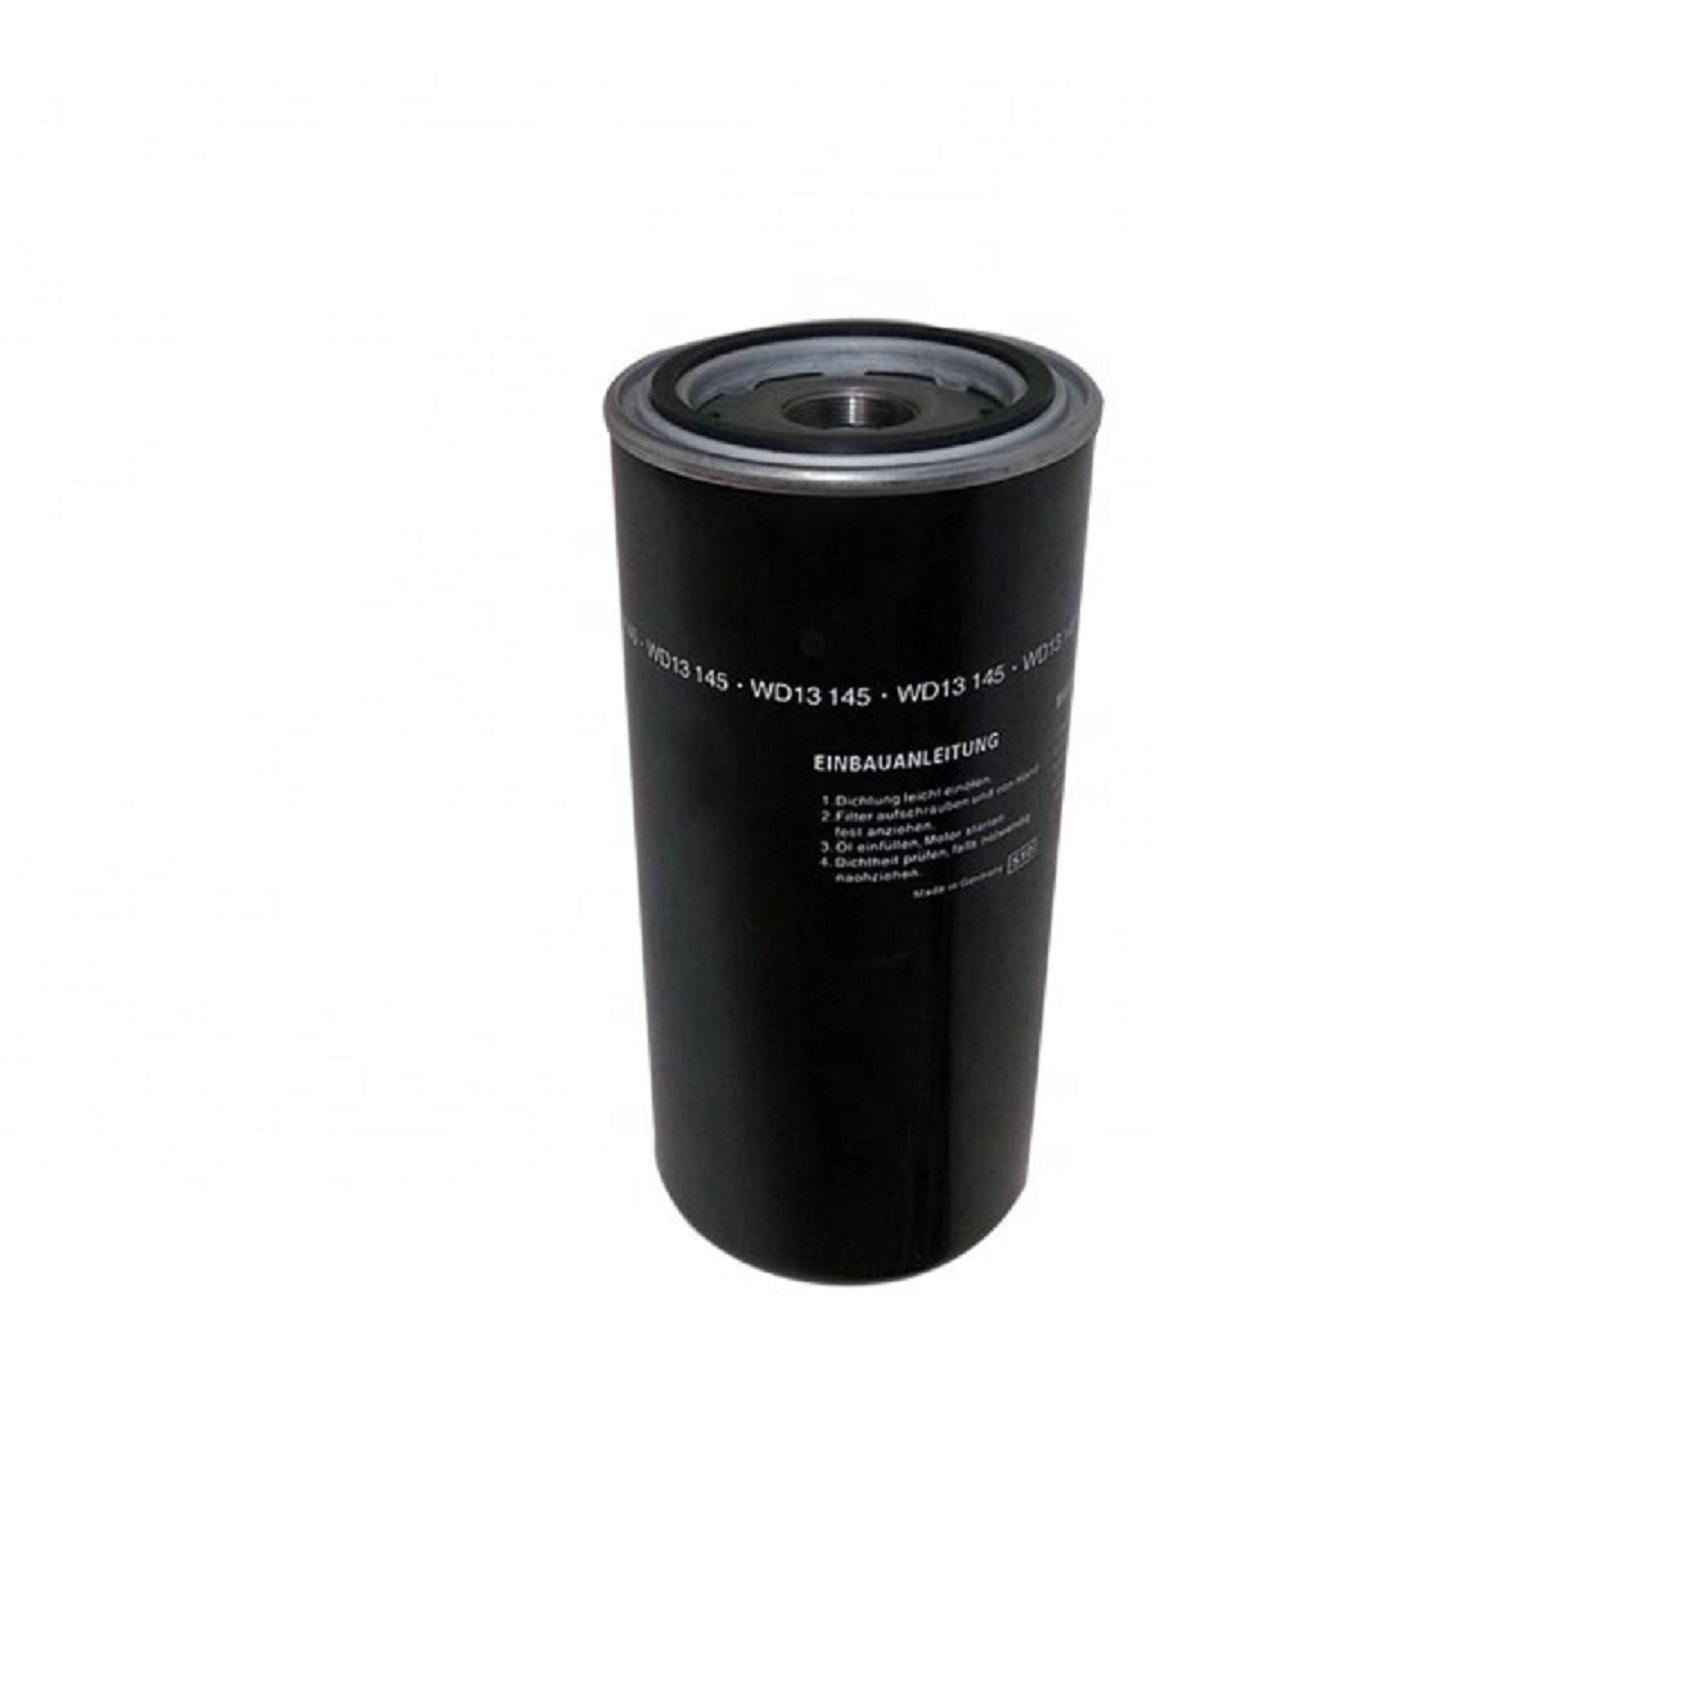 фильтр масляный mann-filter wd13145